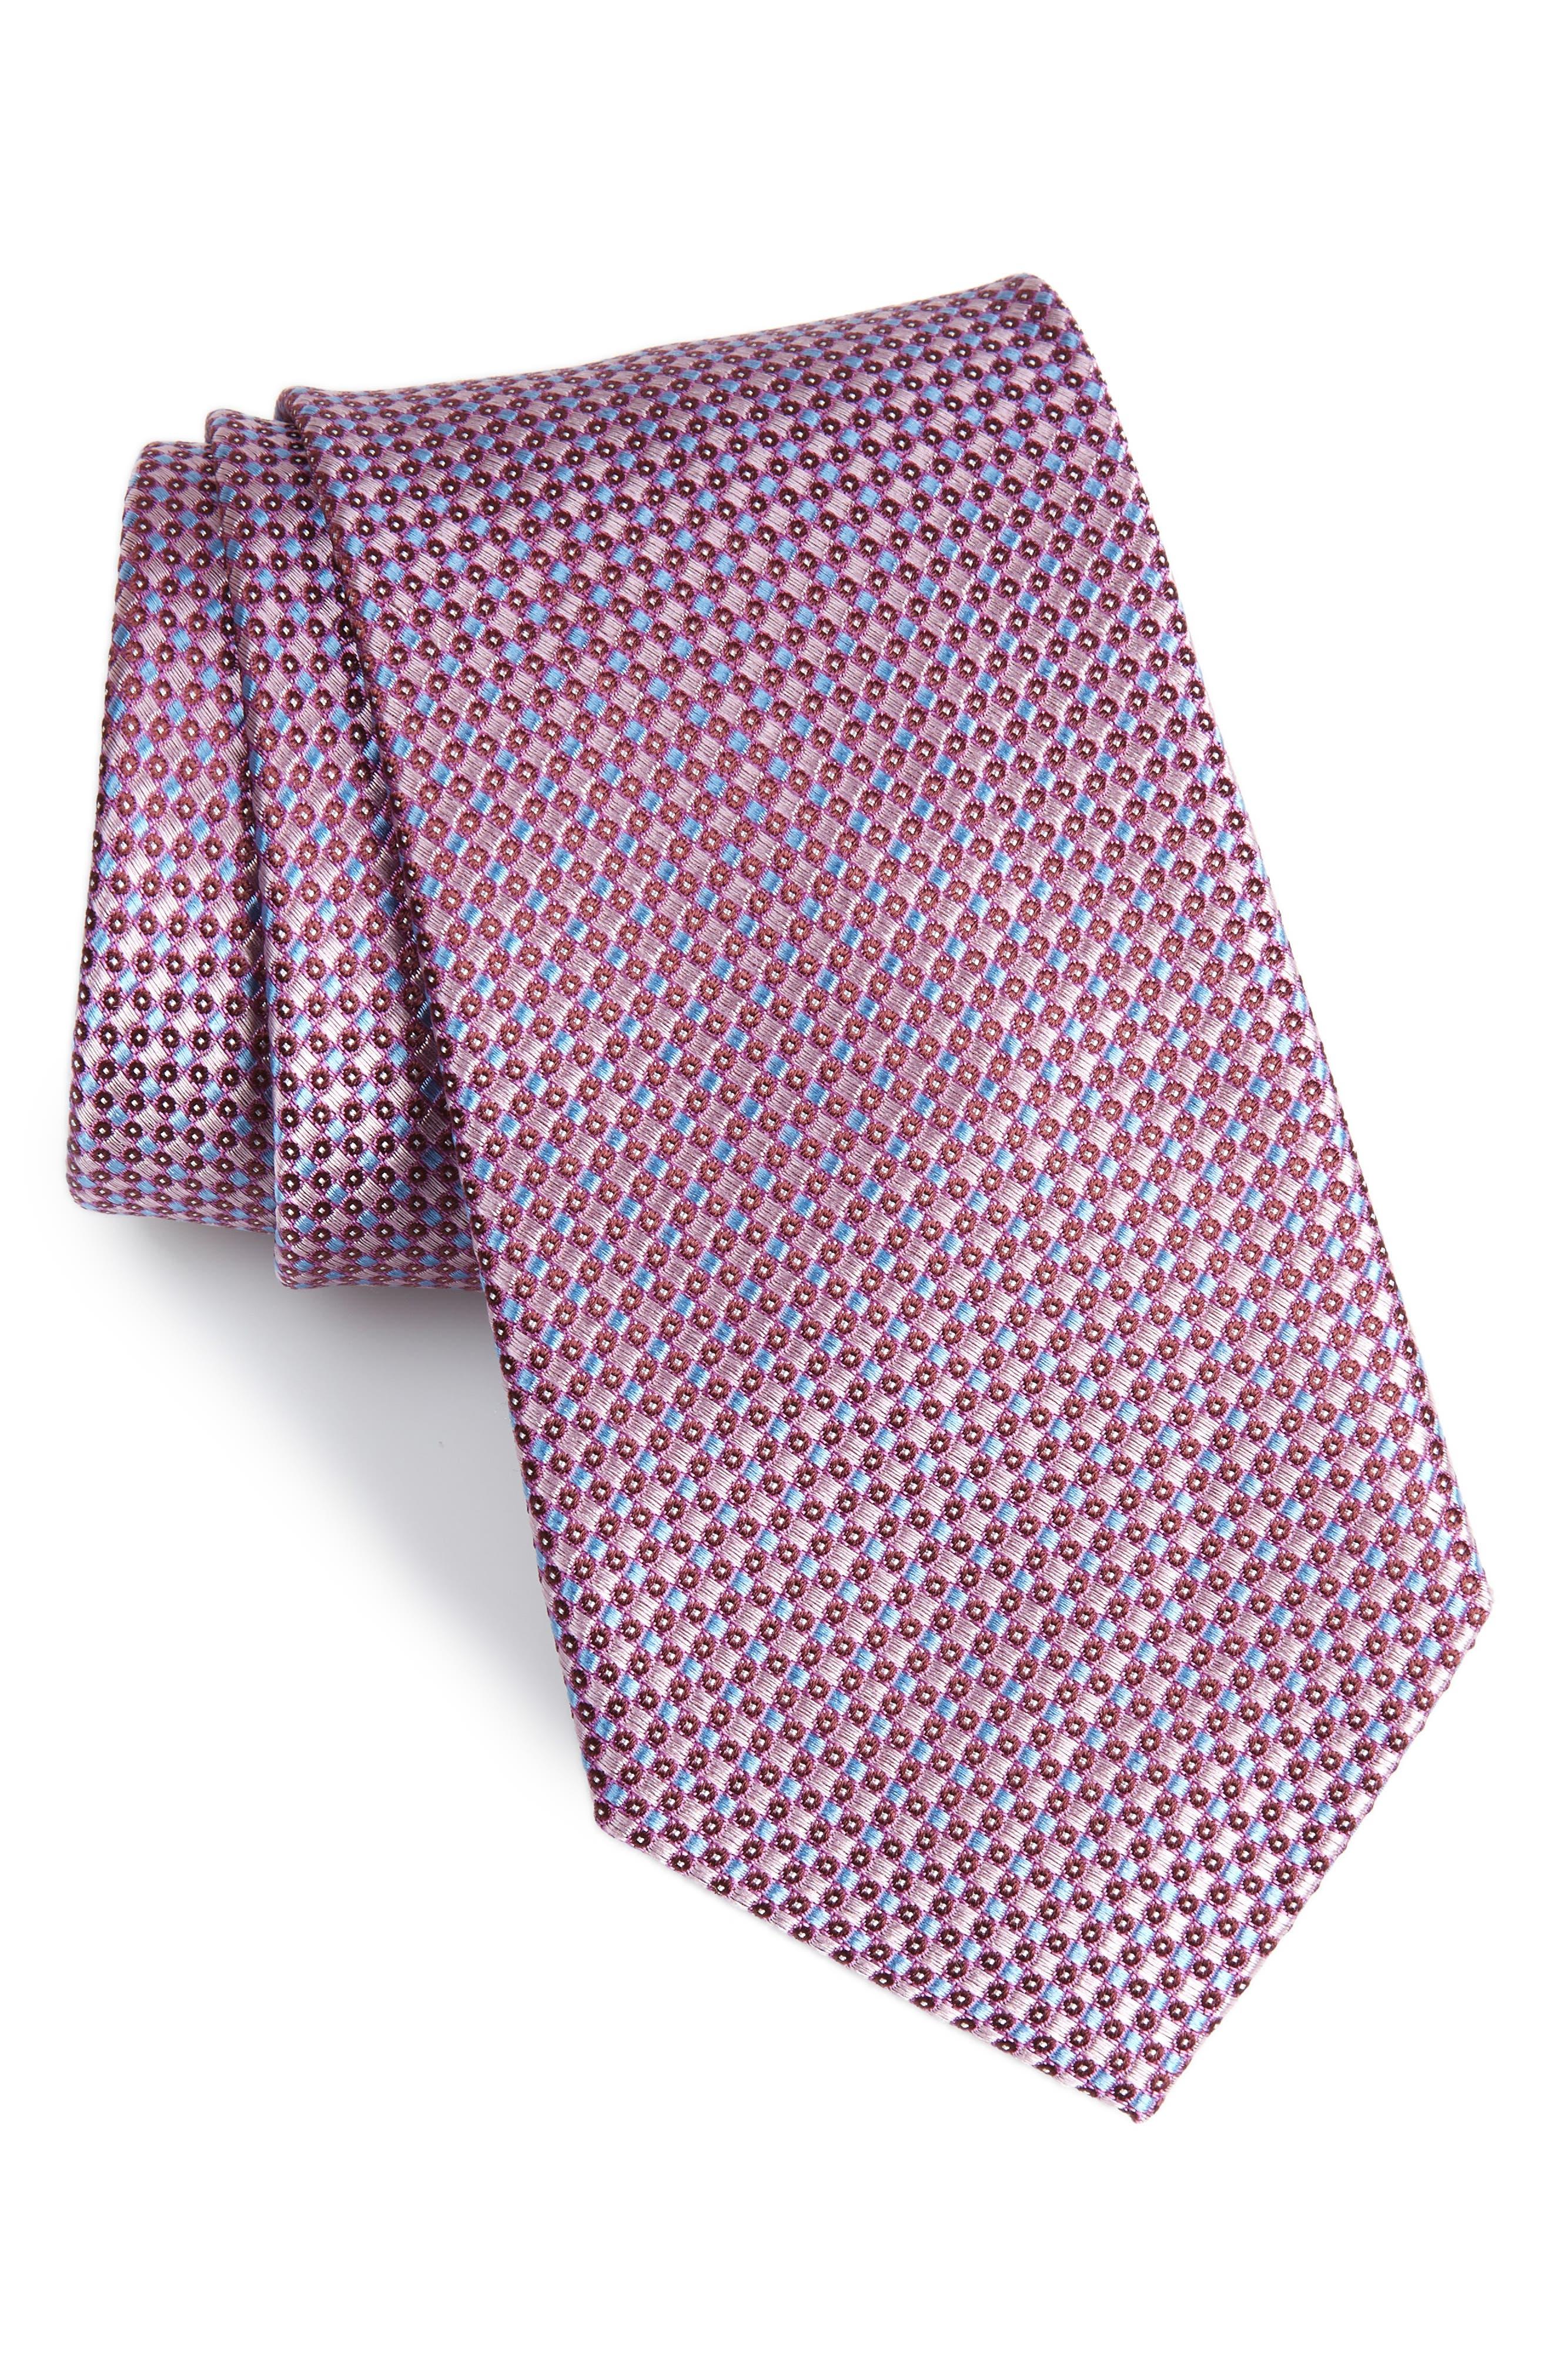 Bagni Check Tie,                             Main thumbnail 3, color,